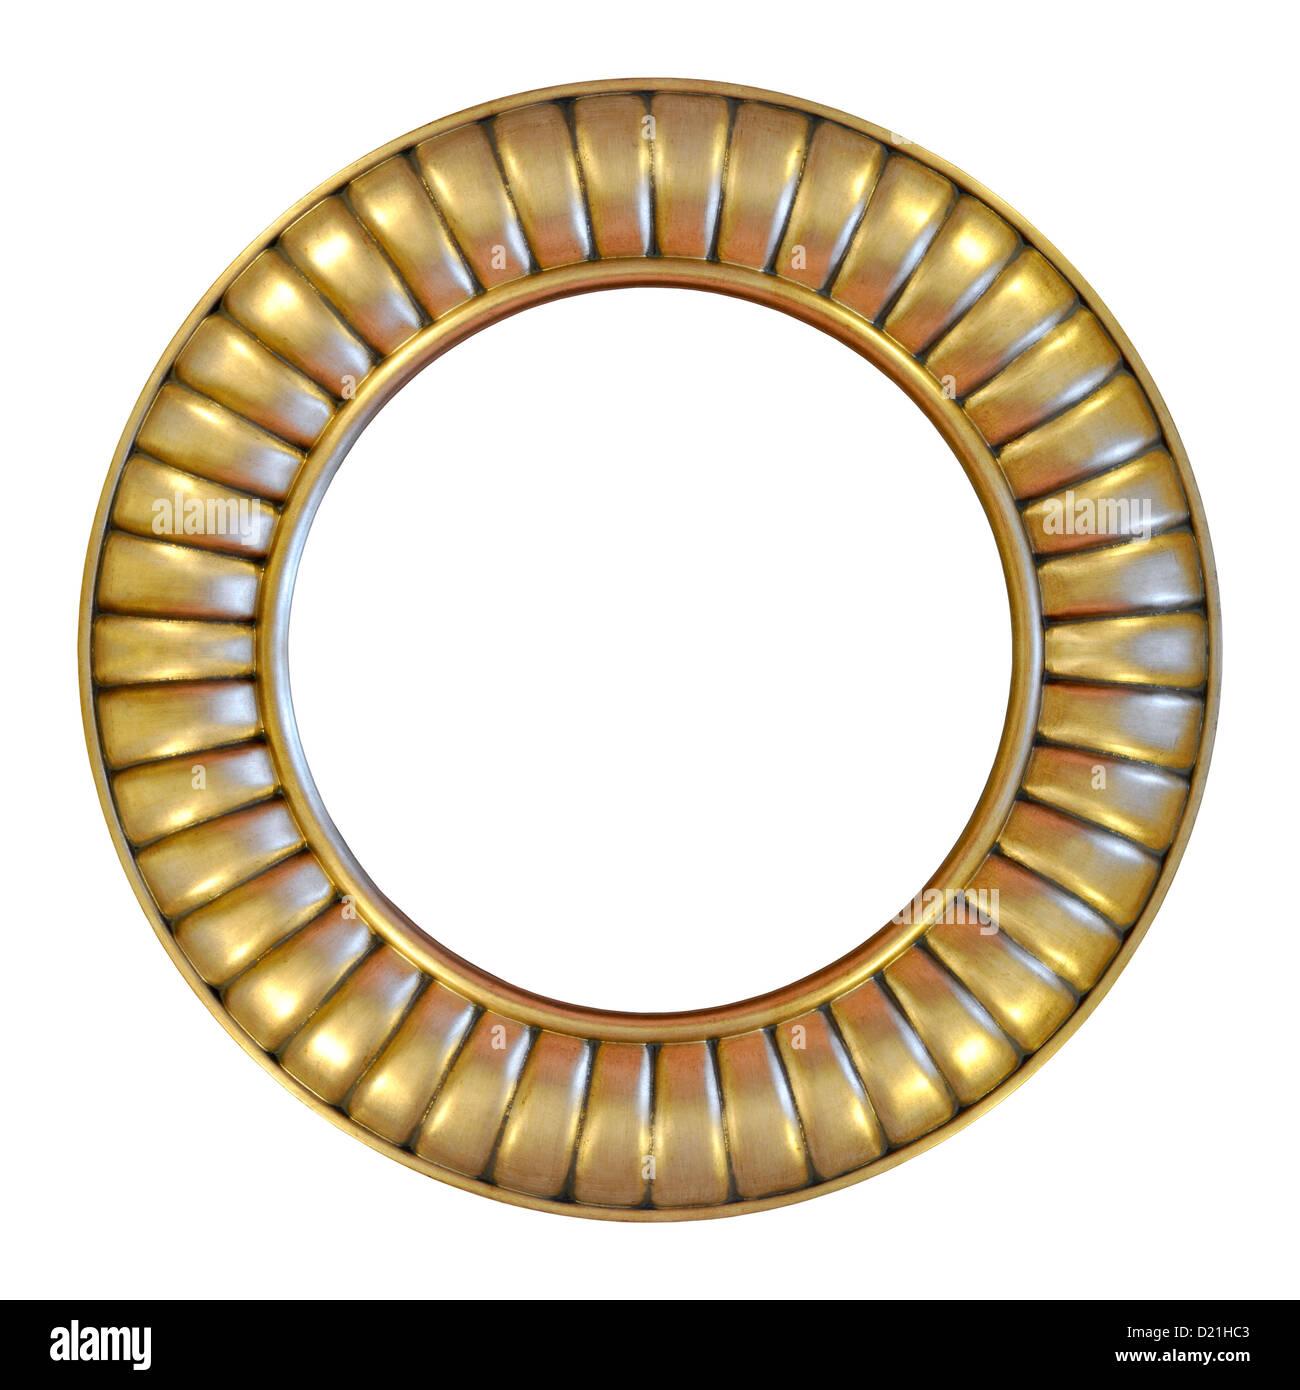 Stylish Design Round Gold Frame Stock Photo Royalty Free